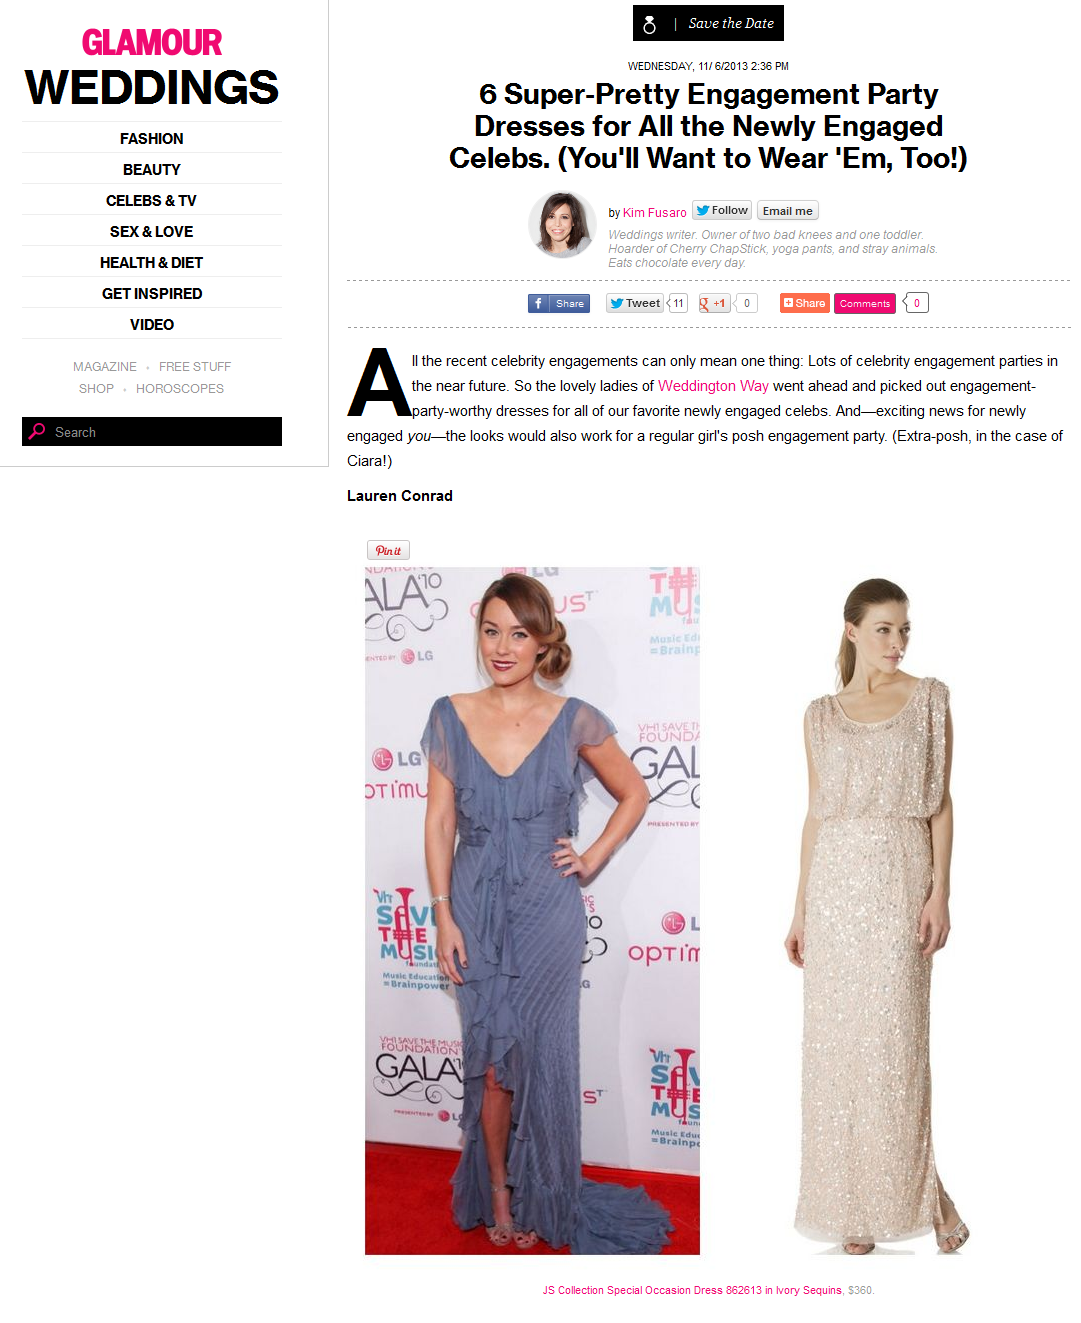 Glamour featured engagement dresses from Weddington Way. November 2013